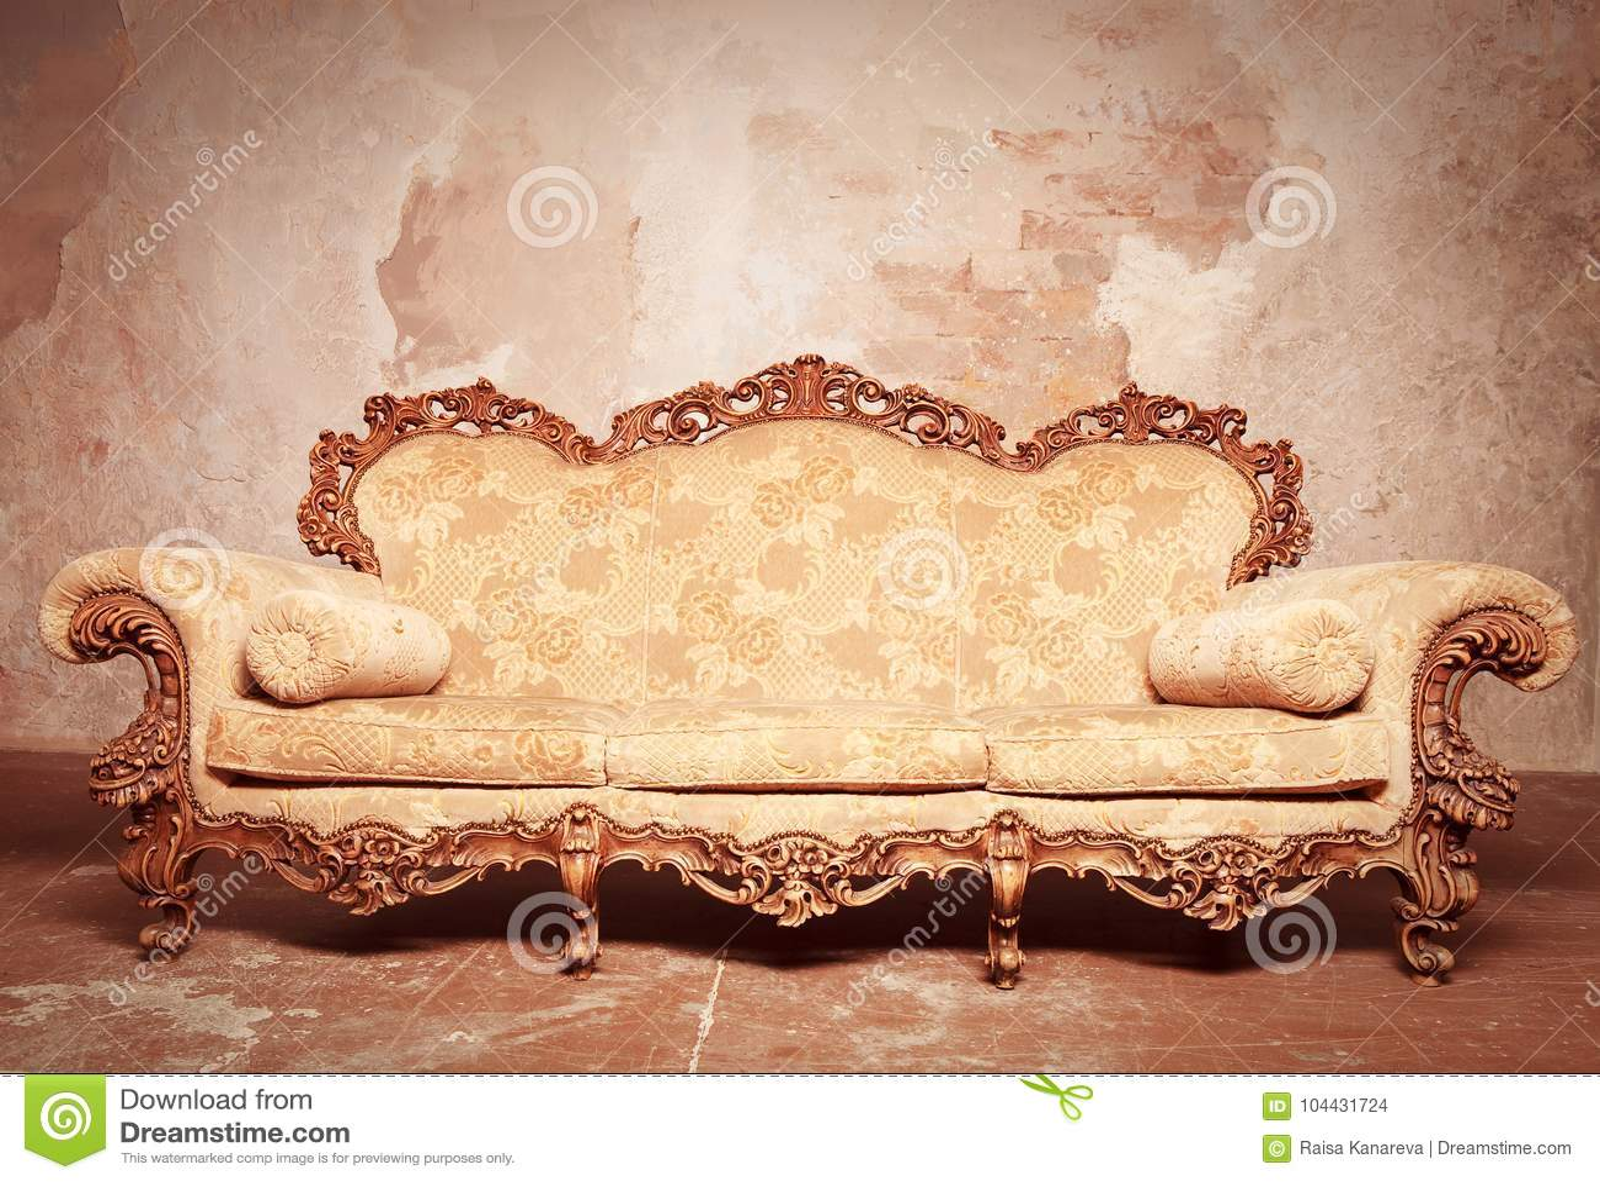 Luxury Baroque Sofa Stock Photo Image Of Living Cushion 104431724